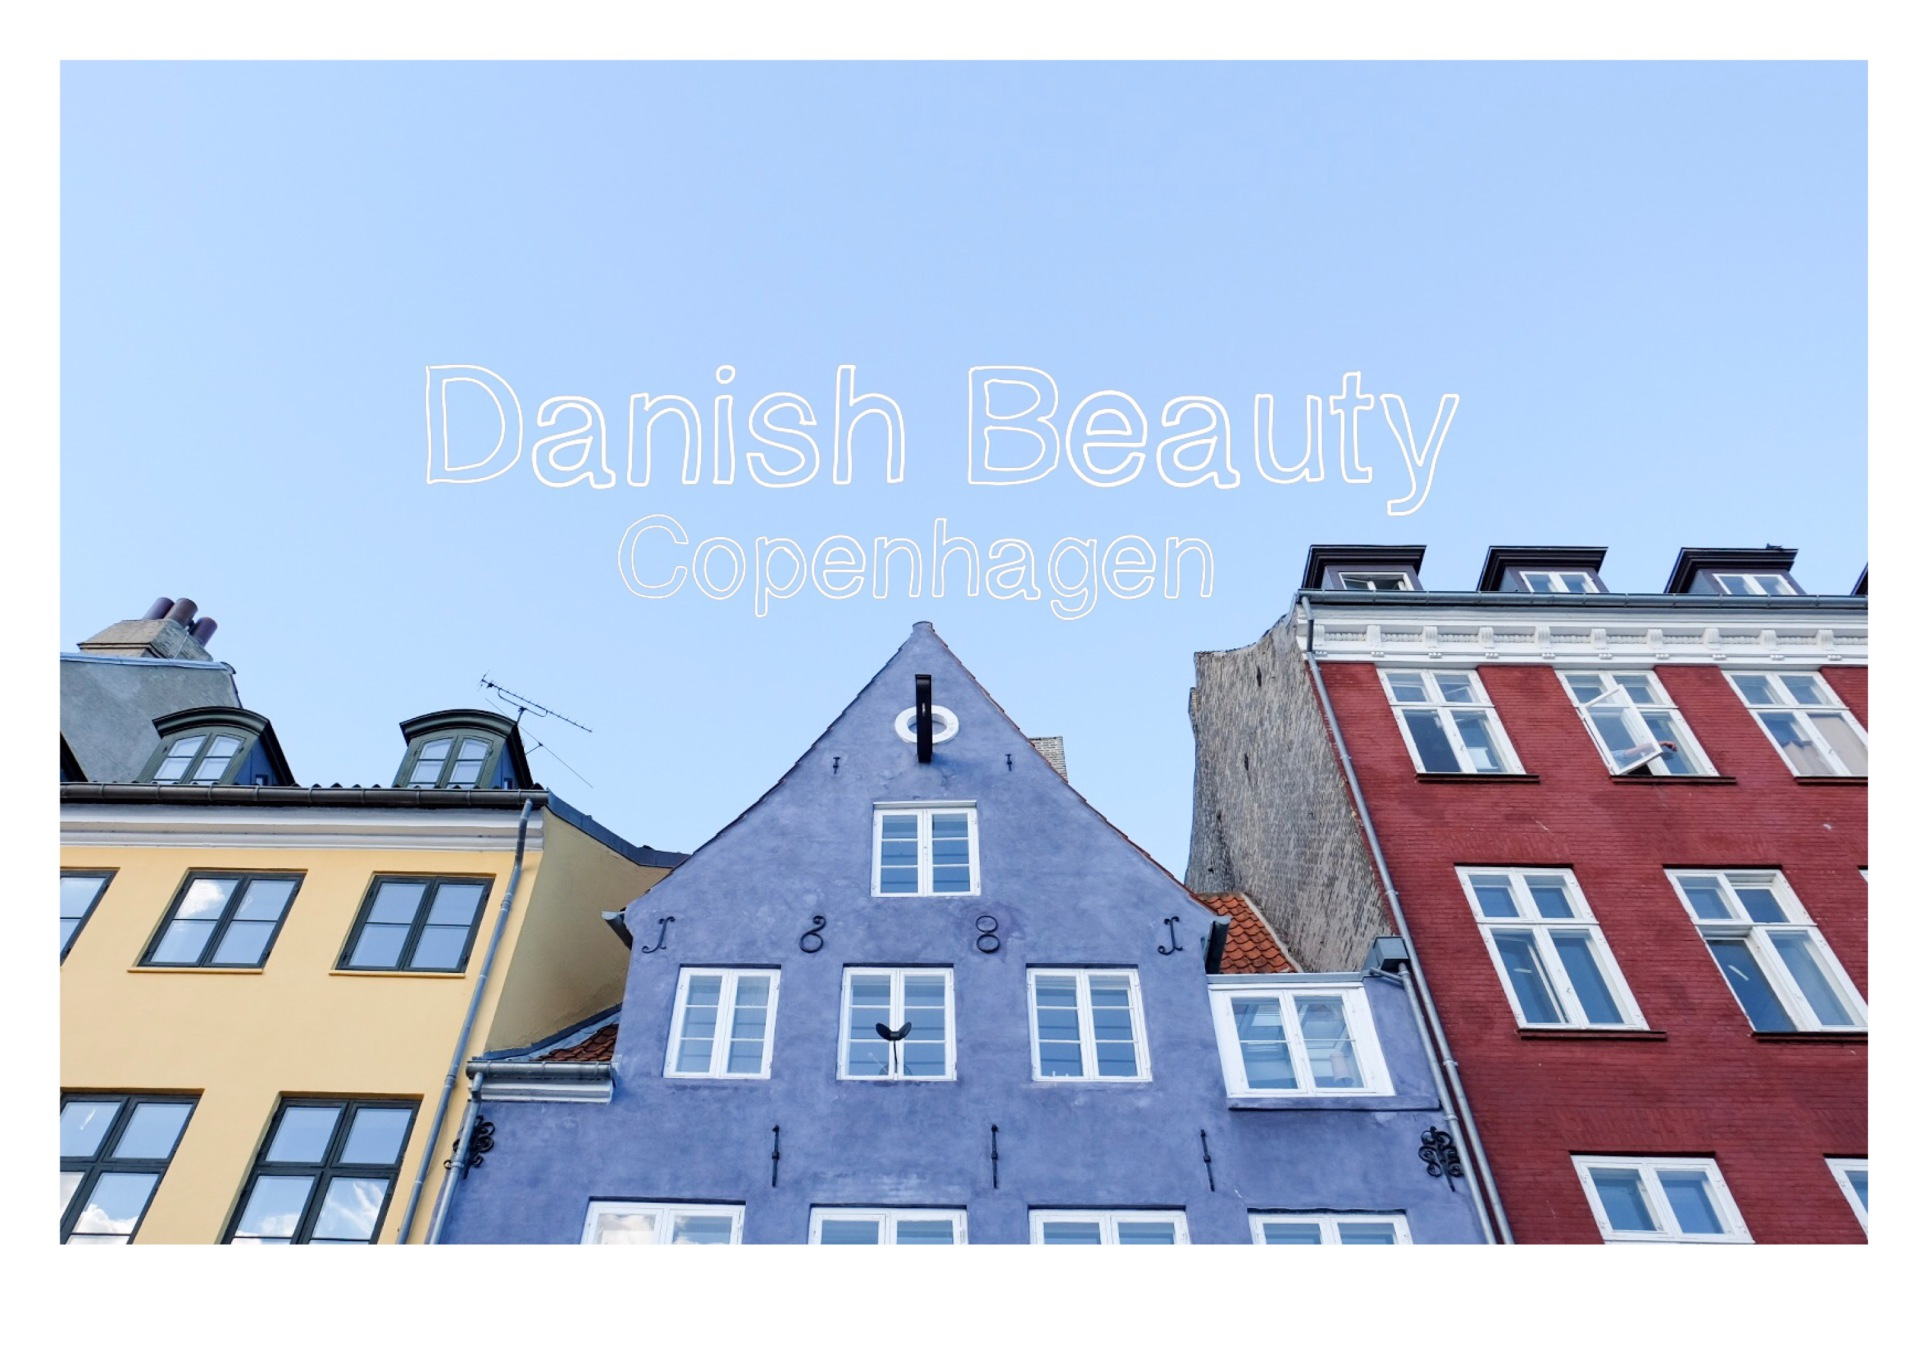 Danish Beauty - Copenhagen